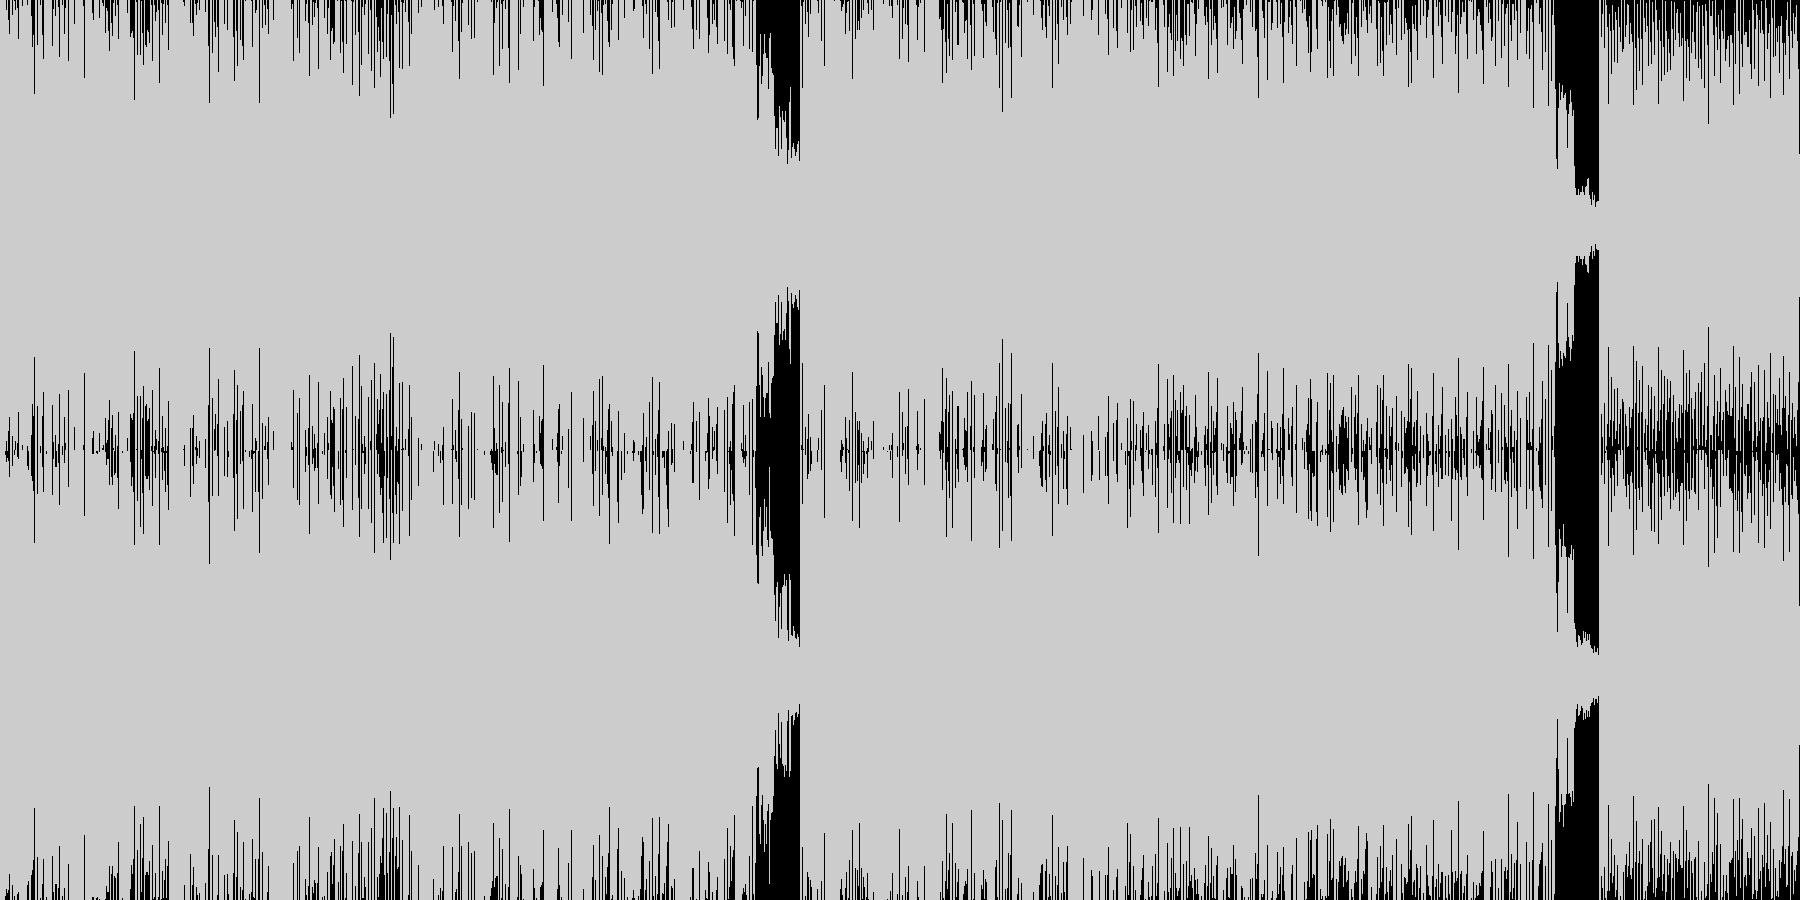 SF的でスピリチュアルなテクノトランスの未再生の波形